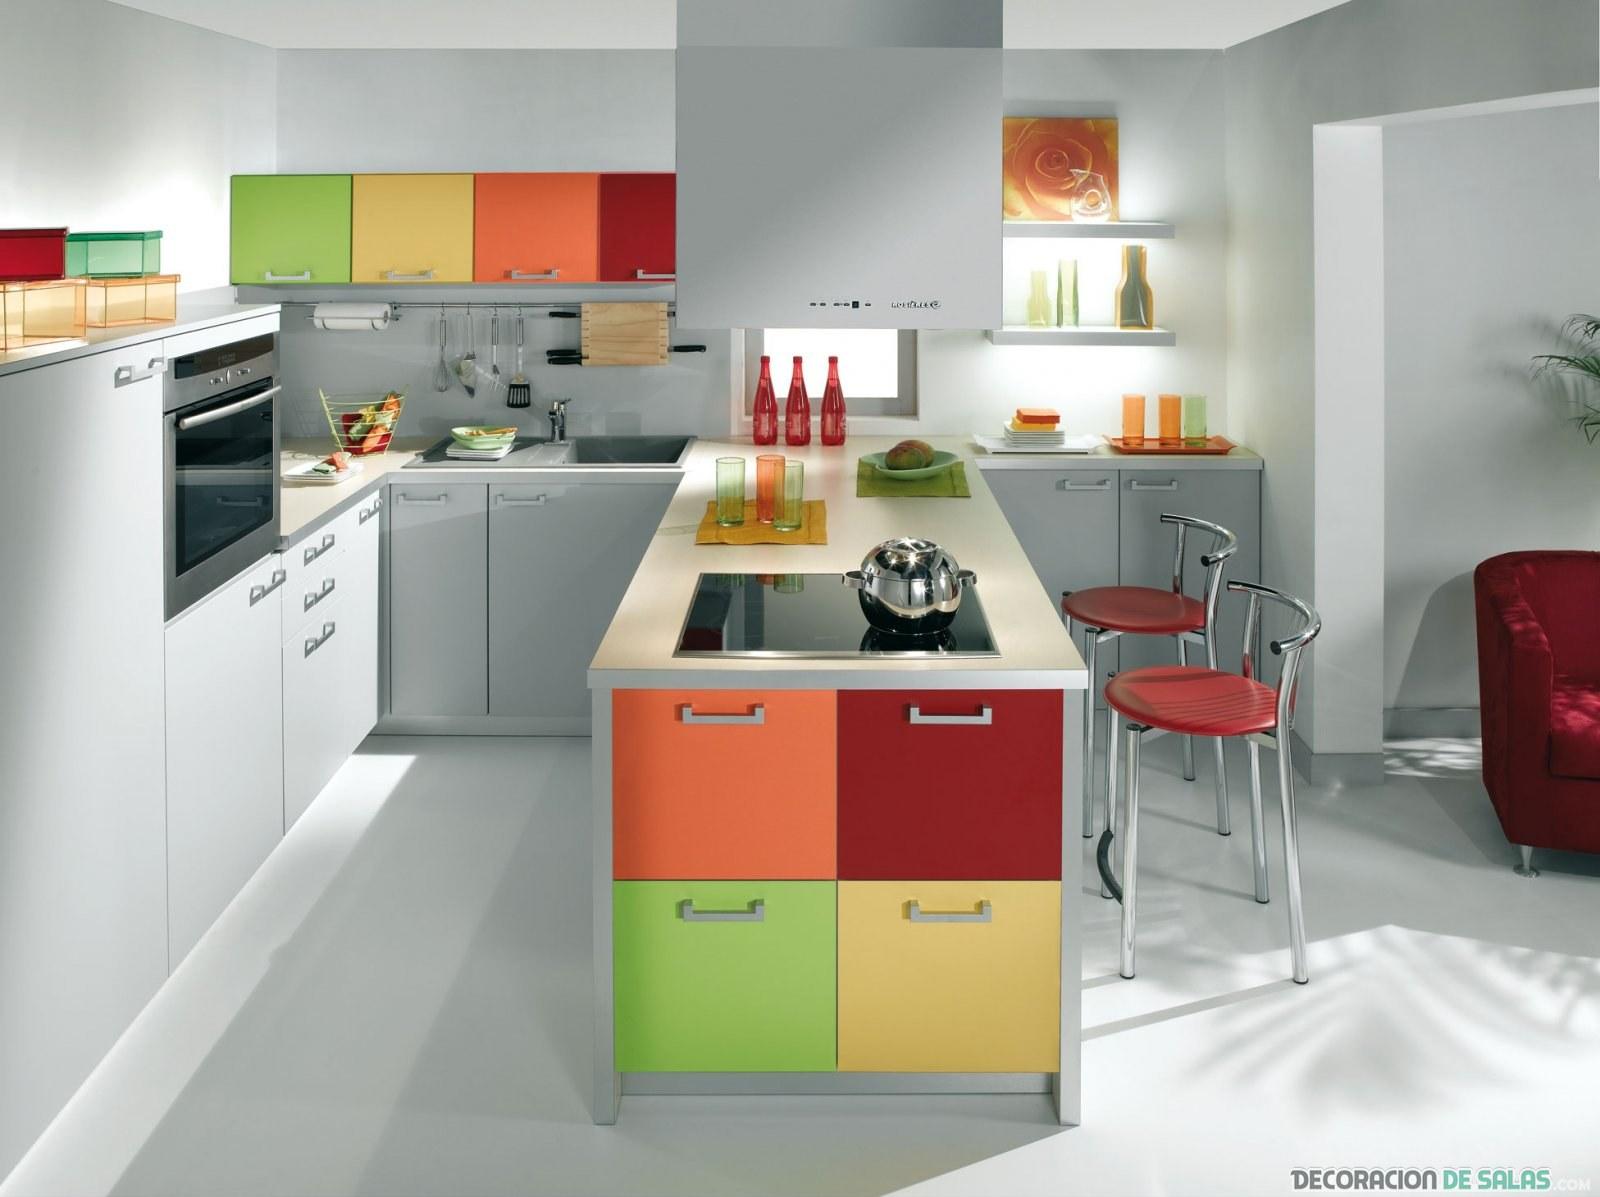 cocina con pinceladas de colores llamativos